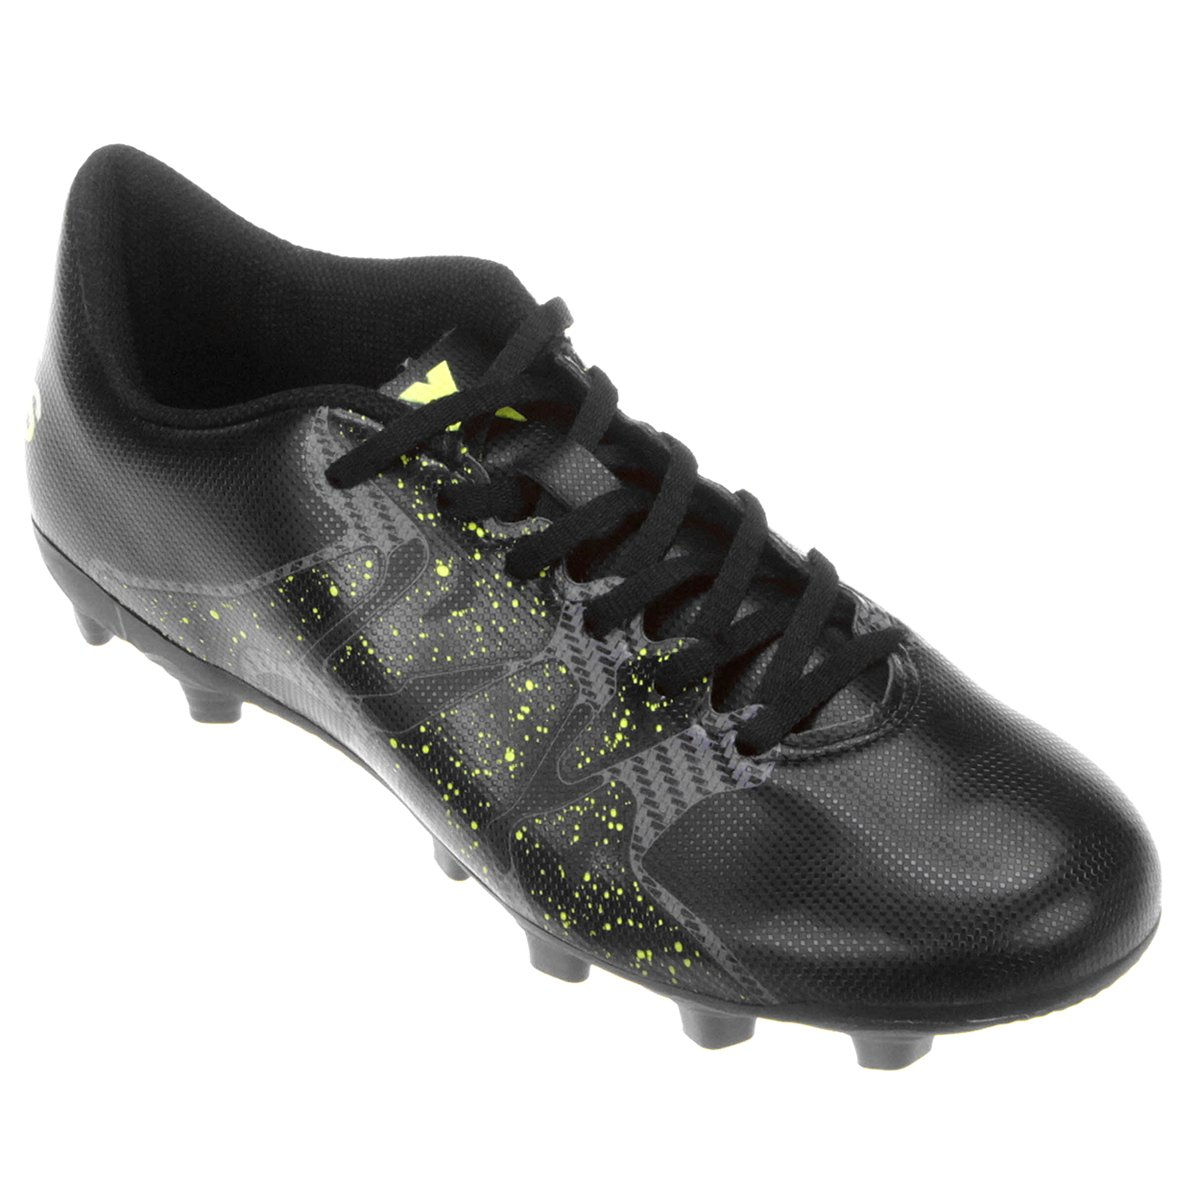 Chuteira Adidas X 15 4 FG Campo - Compre Agora  97c946e91628d